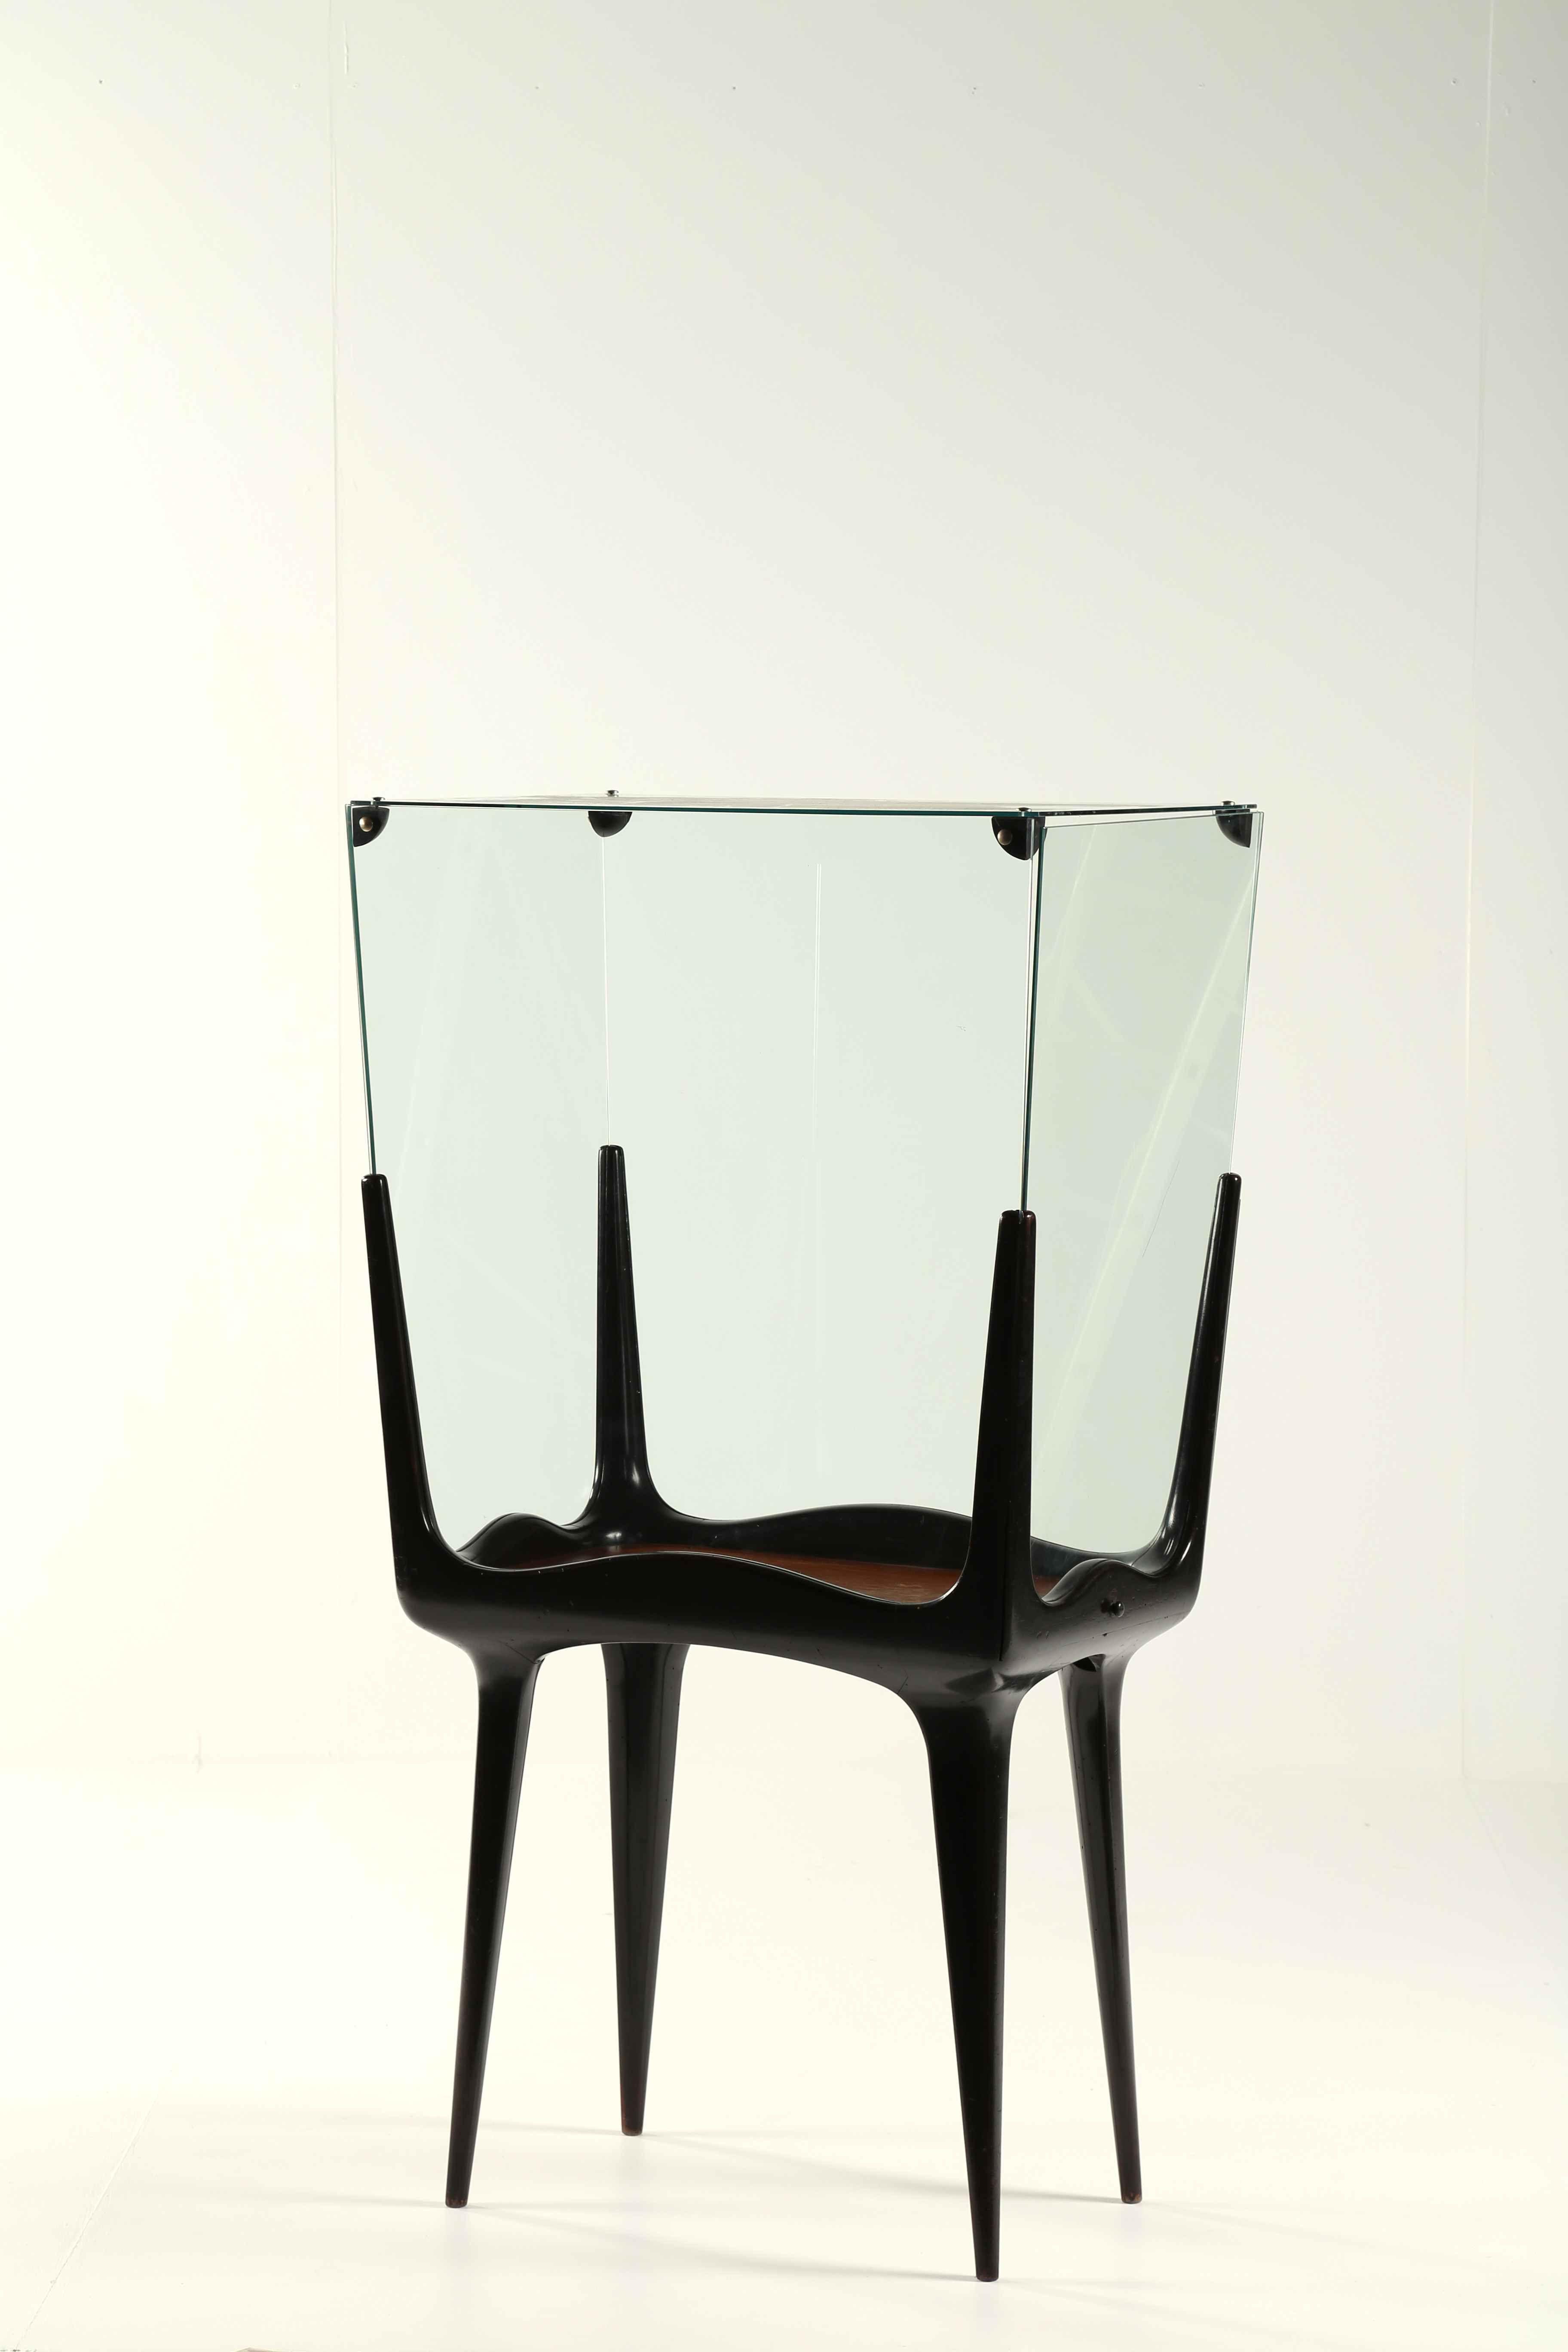 M :: Gianni Saibene; Ebonized Wood, Glass and Brass Display Case by Lussana, 1950s.